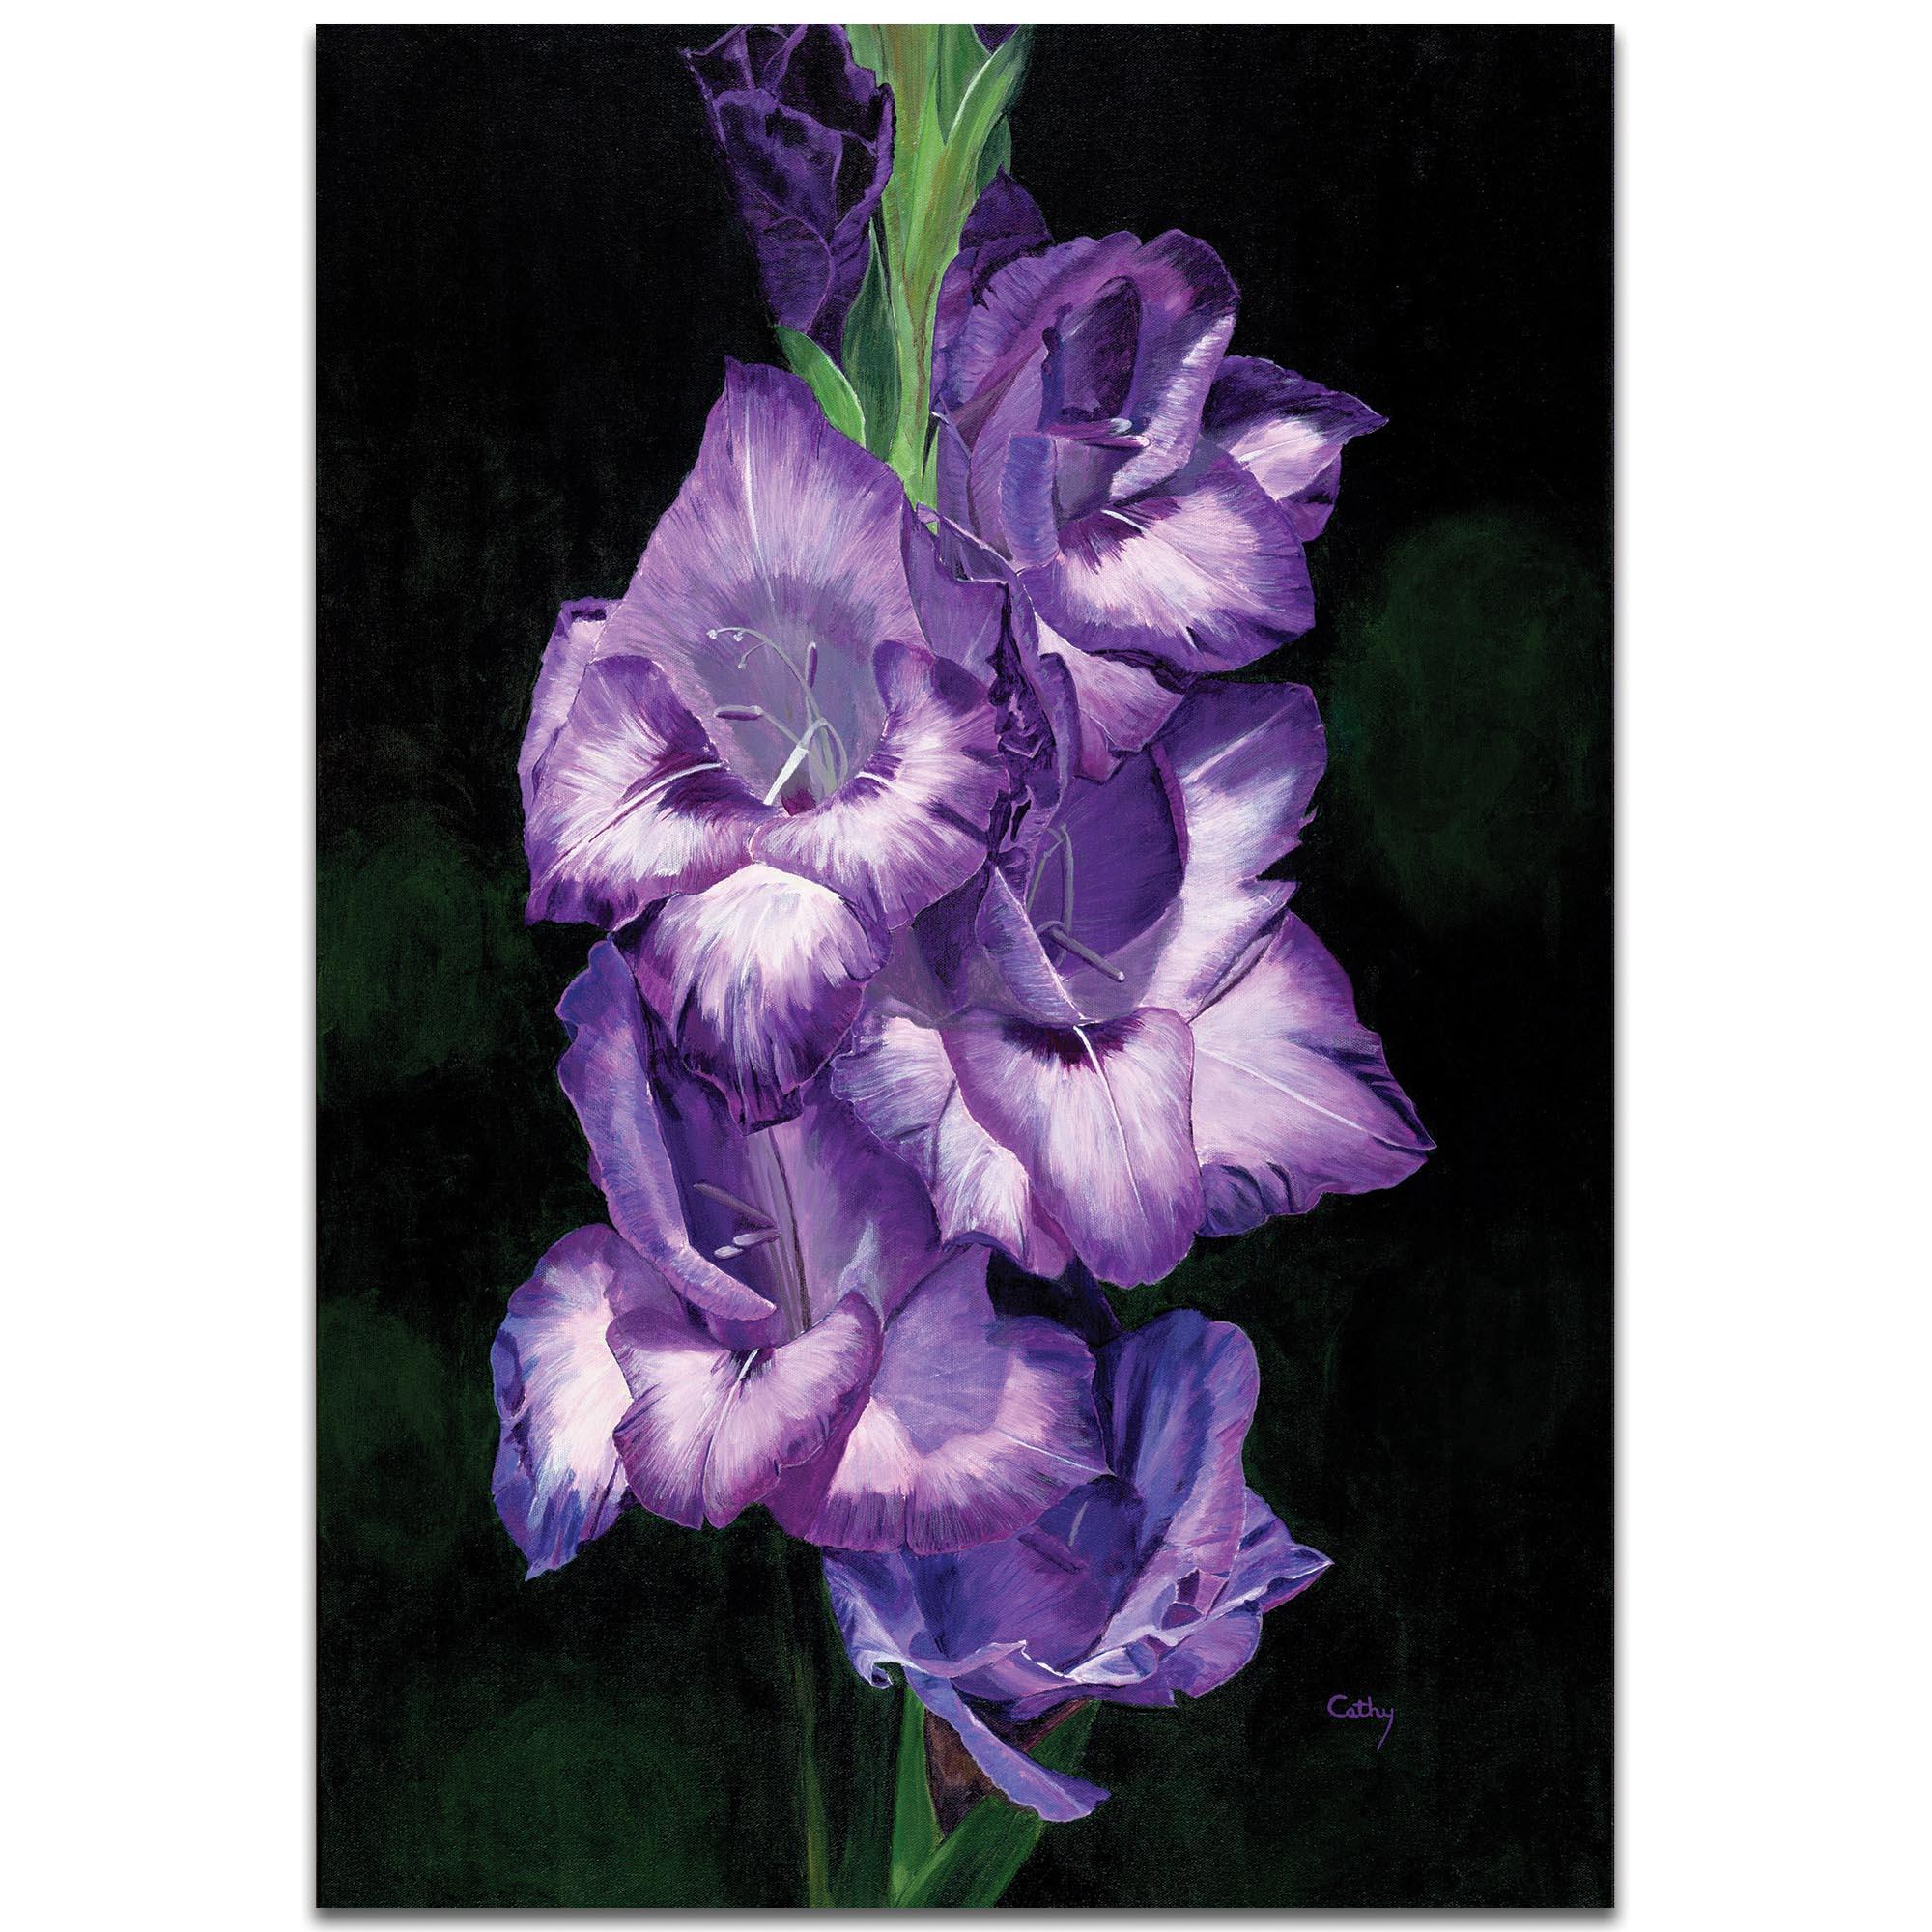 Traditional Wall Art 'Deep Purple Glads' - Floral Decor on Metal or Plexiglass